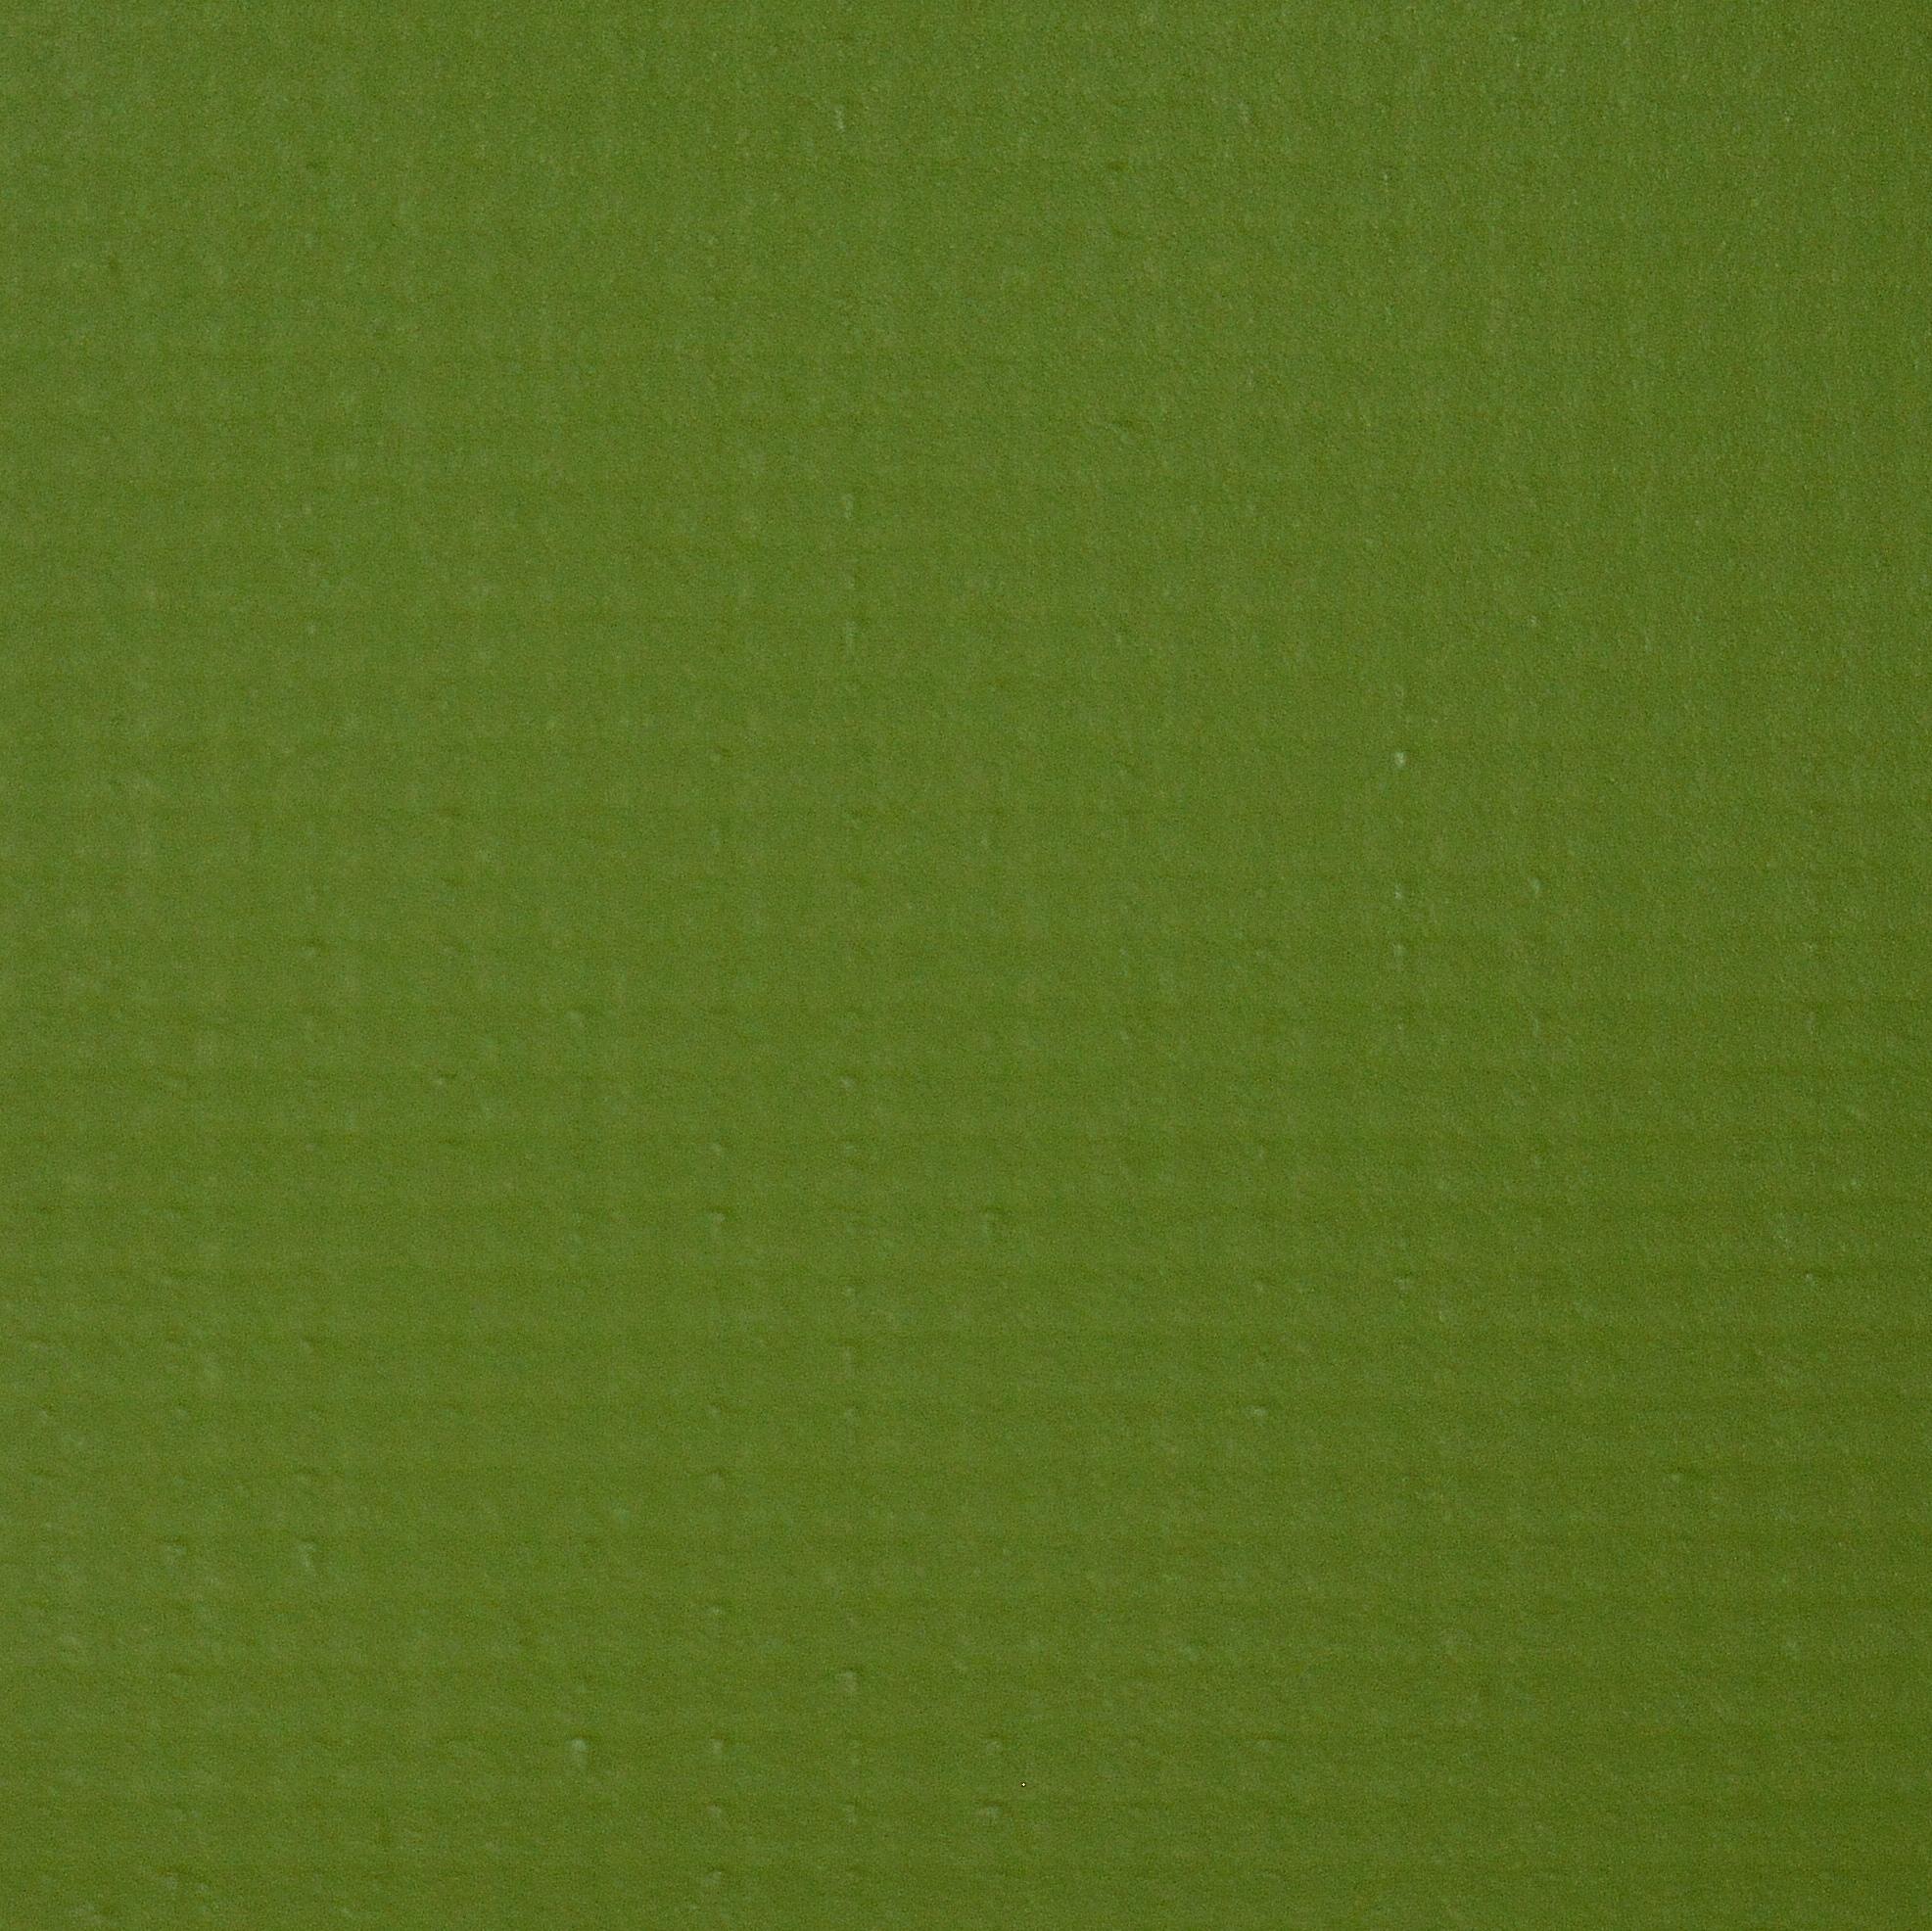 Coolshade Leaf